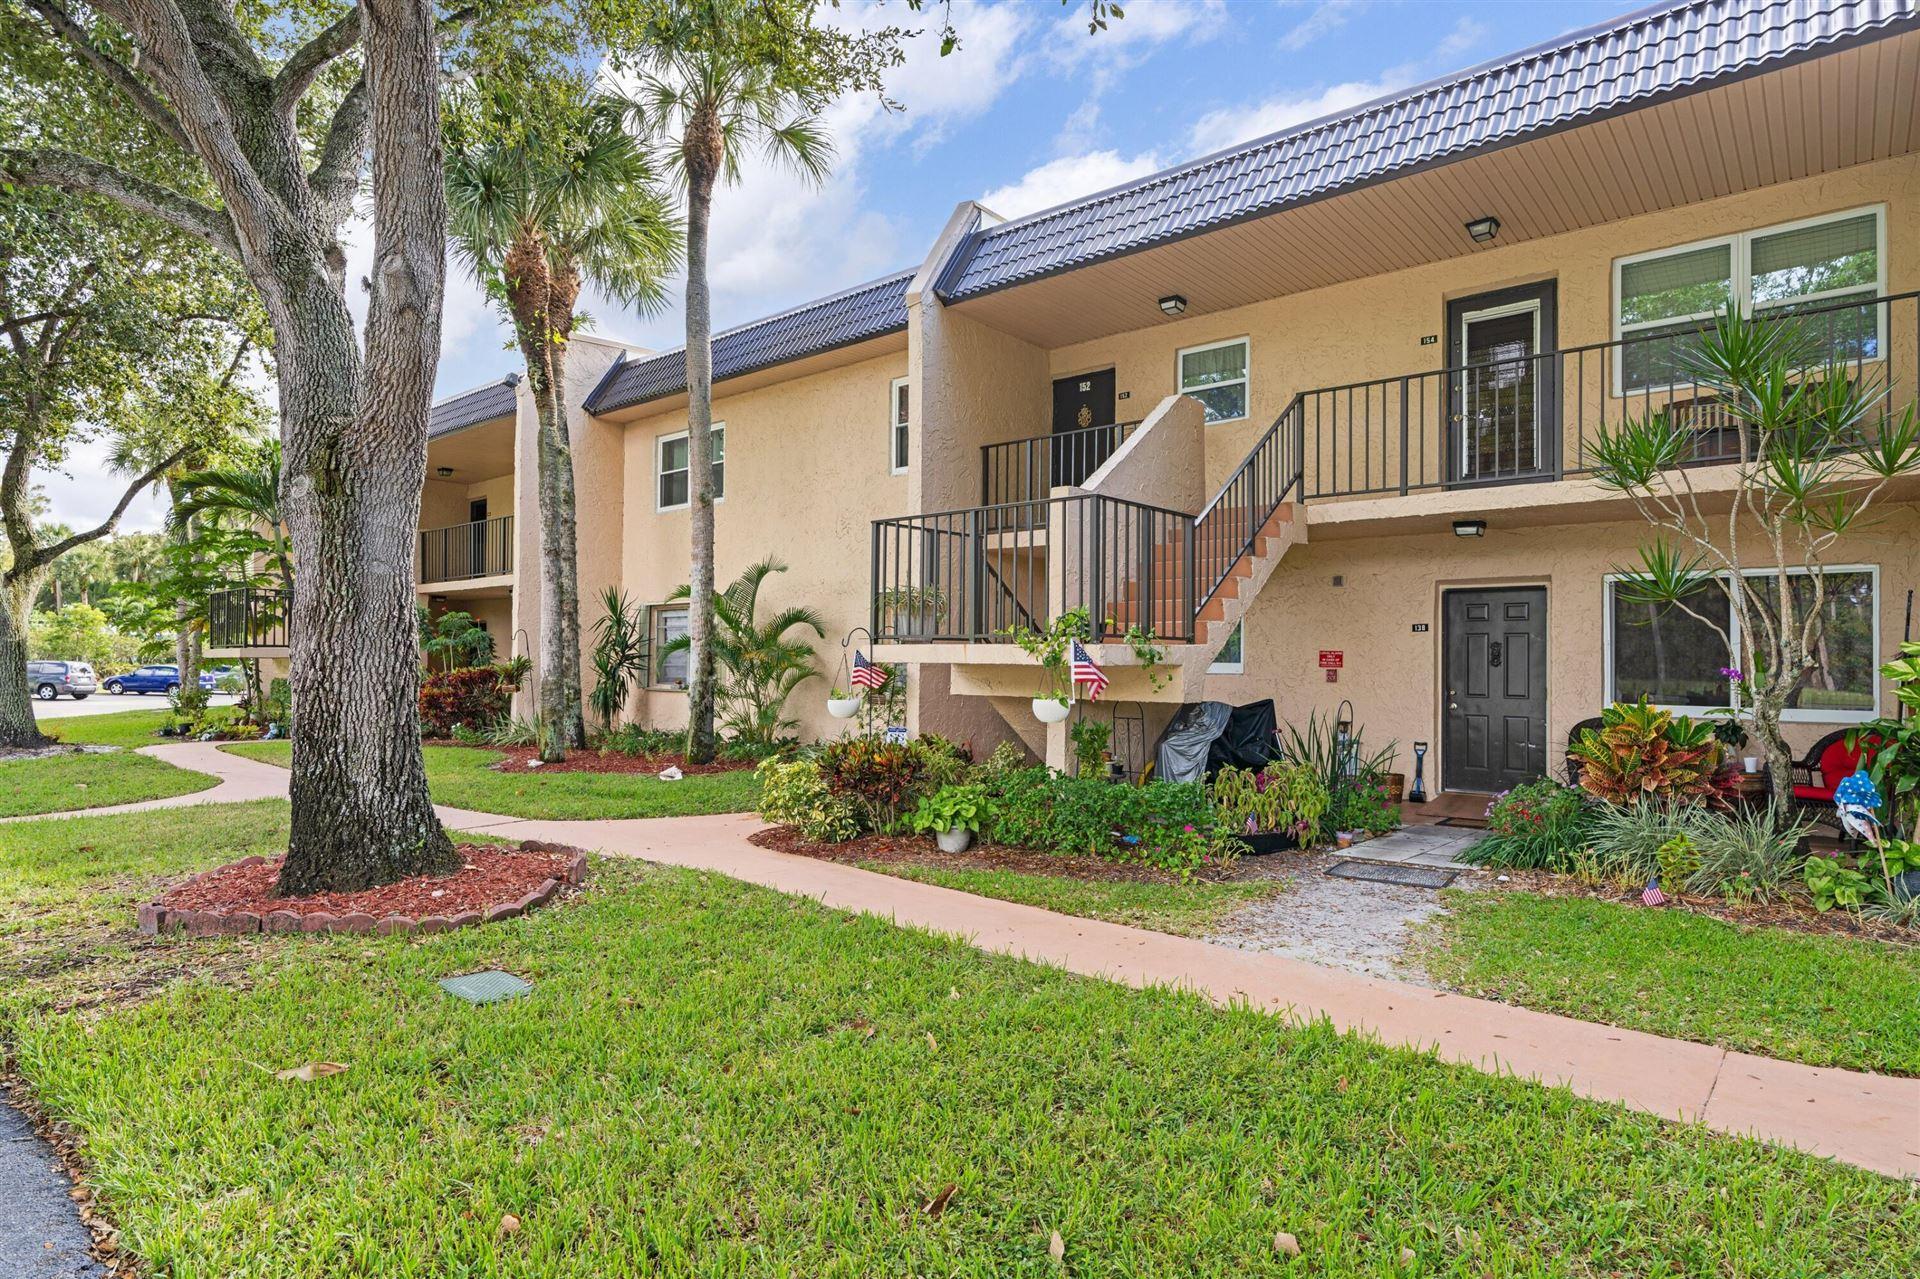 152 Lake Constance Drive, West Palm Beach, FL 33411 - MLS#: RX-10753192